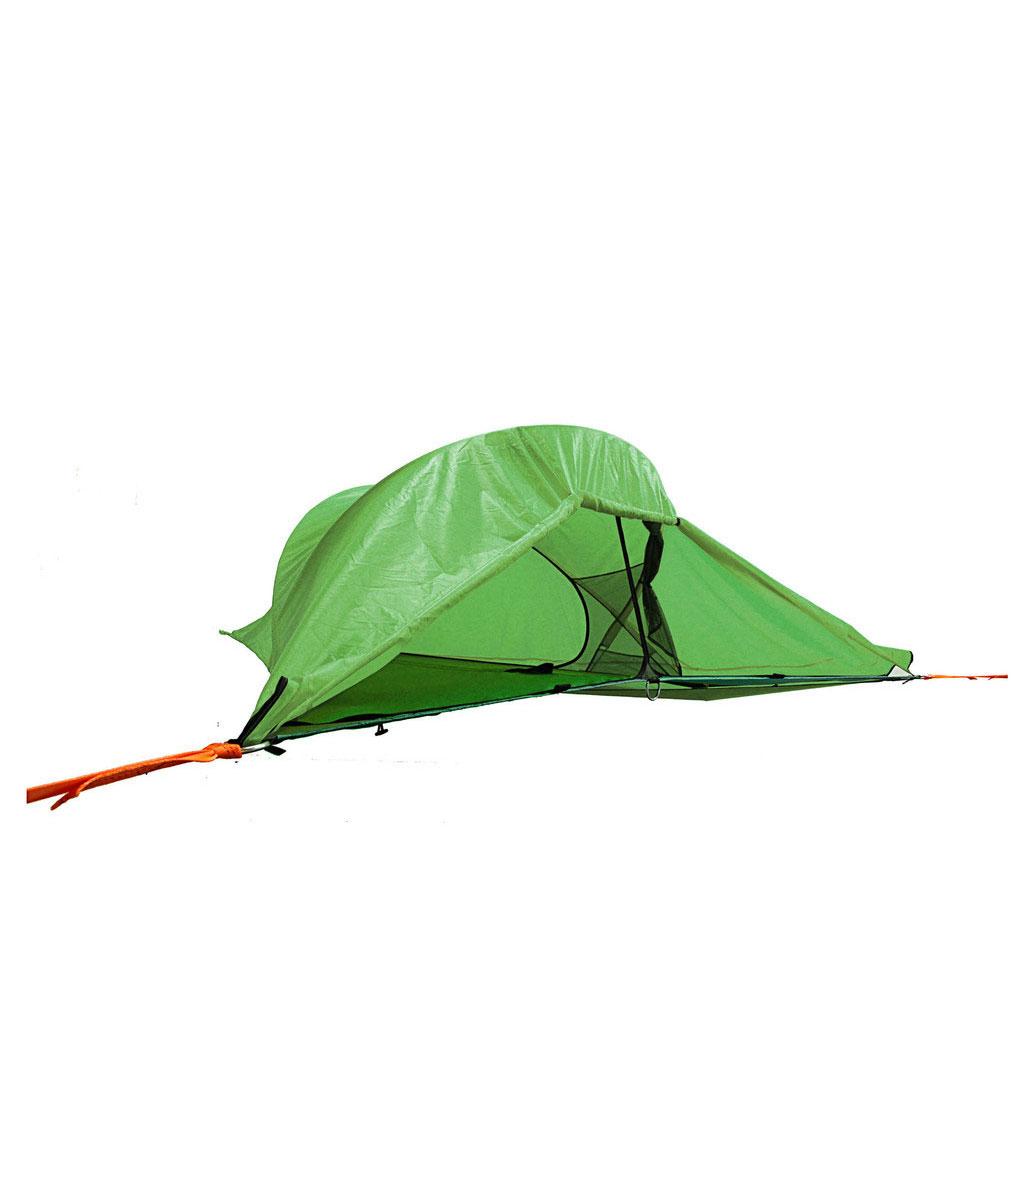 slackline-tree-tent-australia-2-person-c&ing  sc 1 st  Slackline Shop Australia & Slackline Connect Tree Tent - Slackline Shop Australia